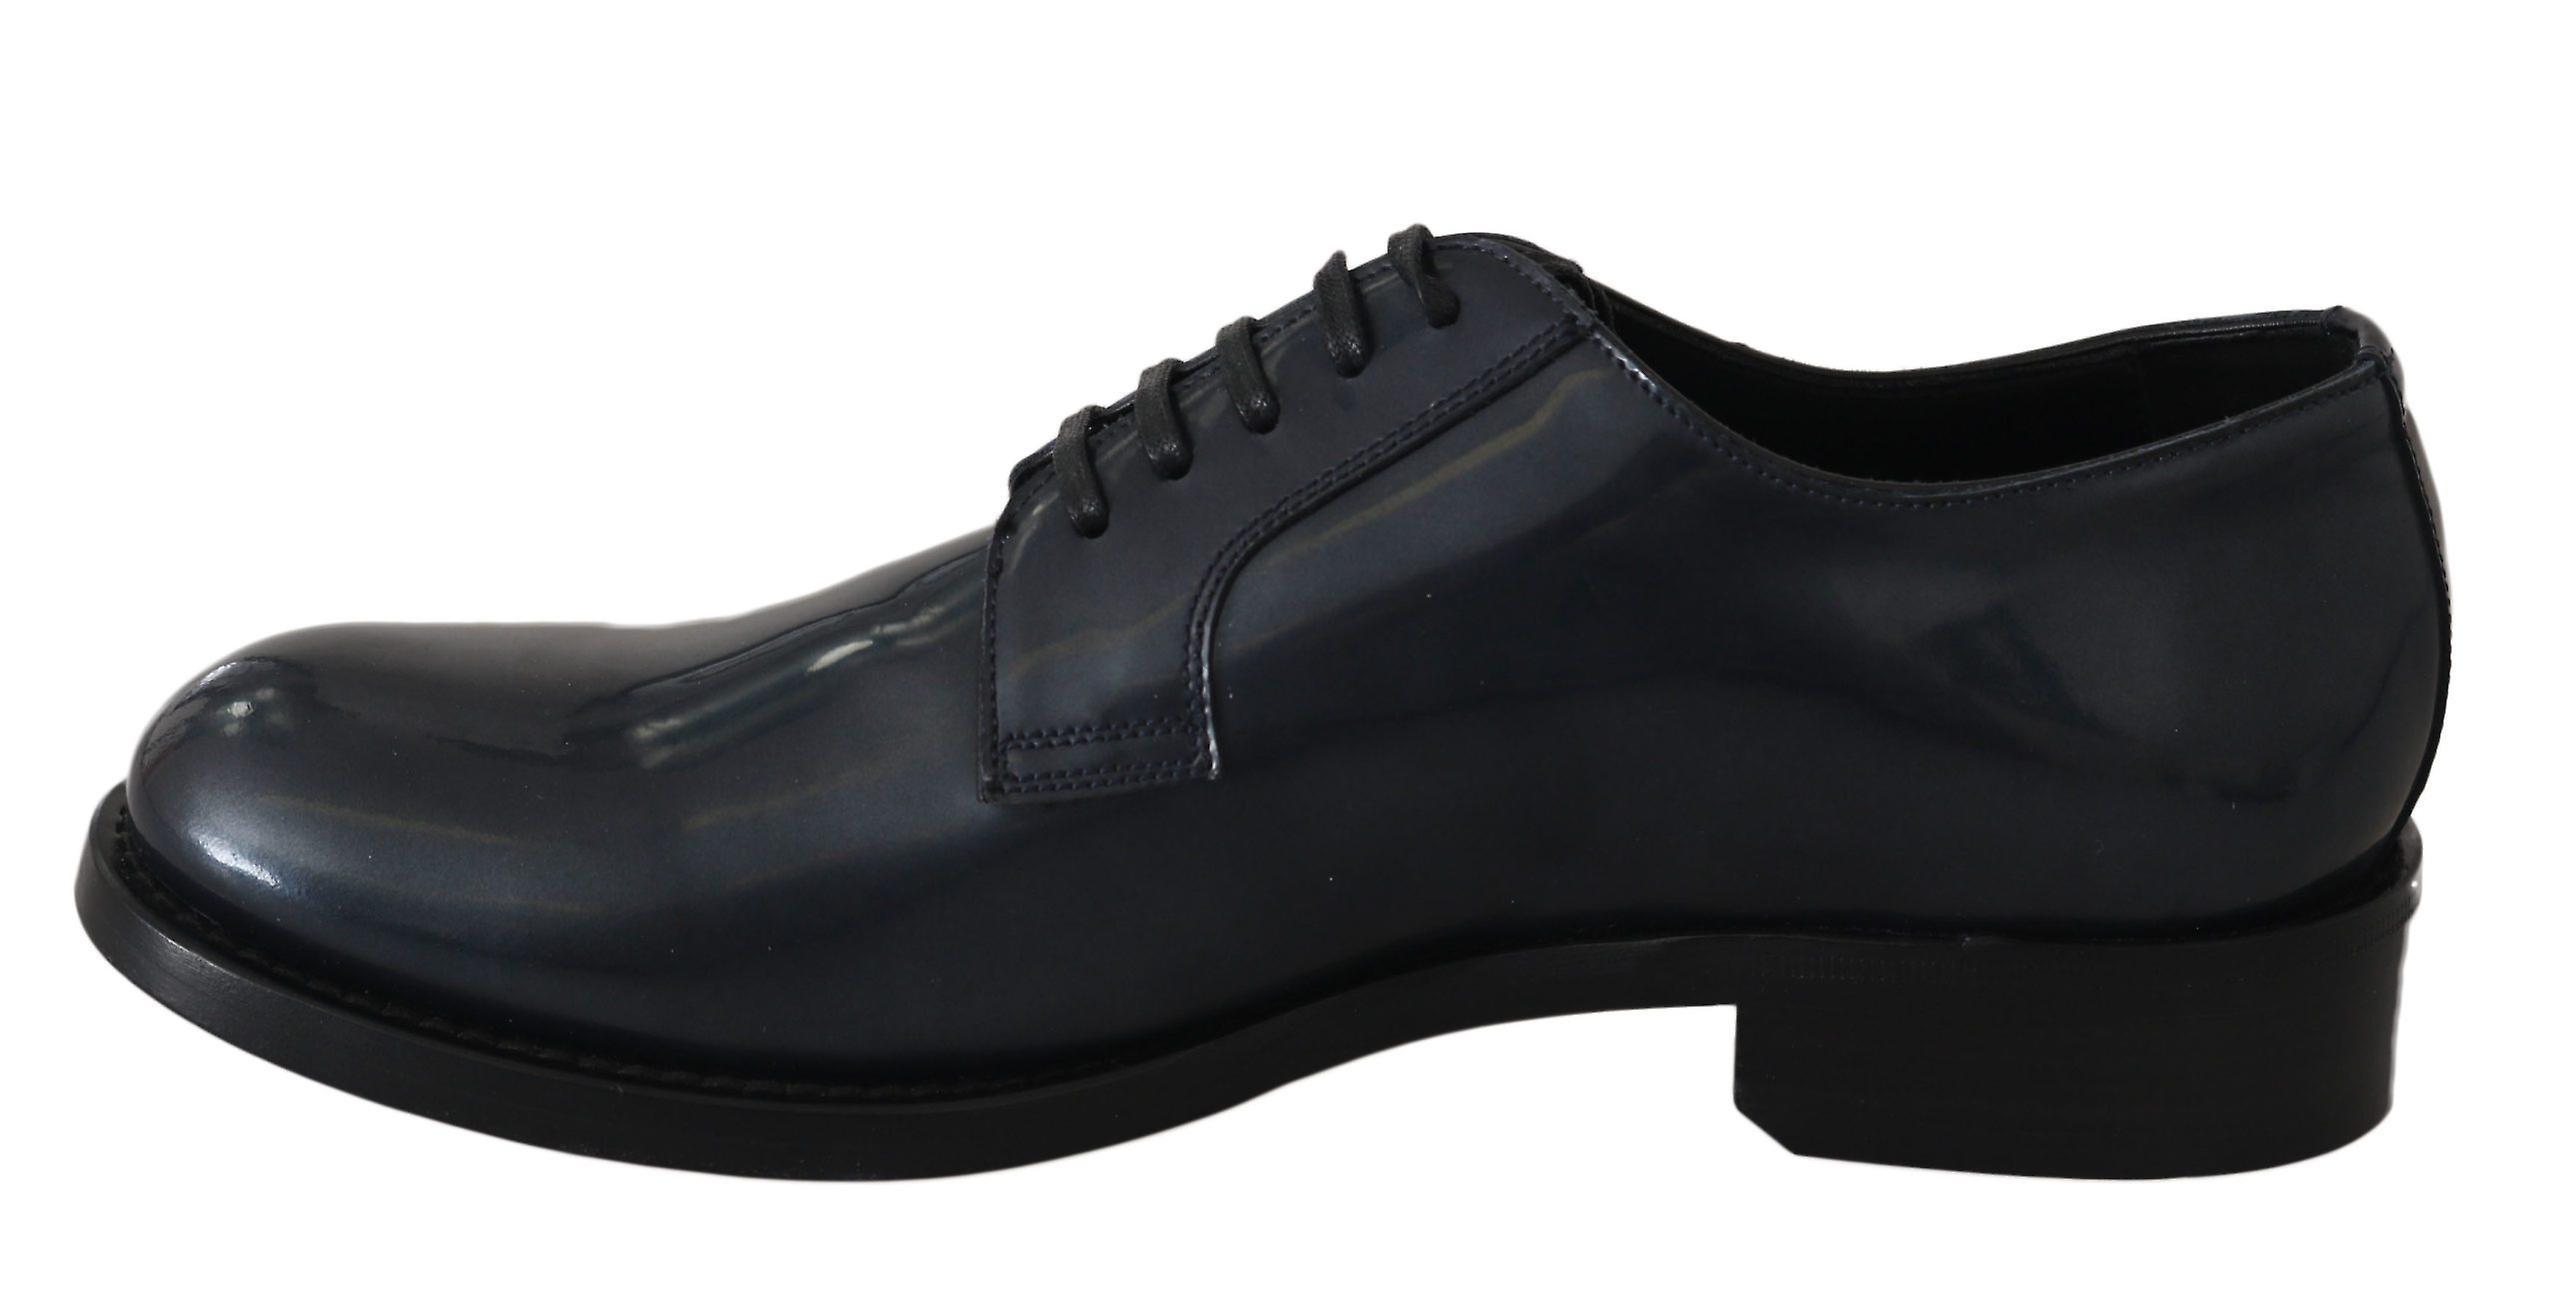 Dolce & Gabbana Blue Leather Derby Dress Formal Shoes MV2436-39